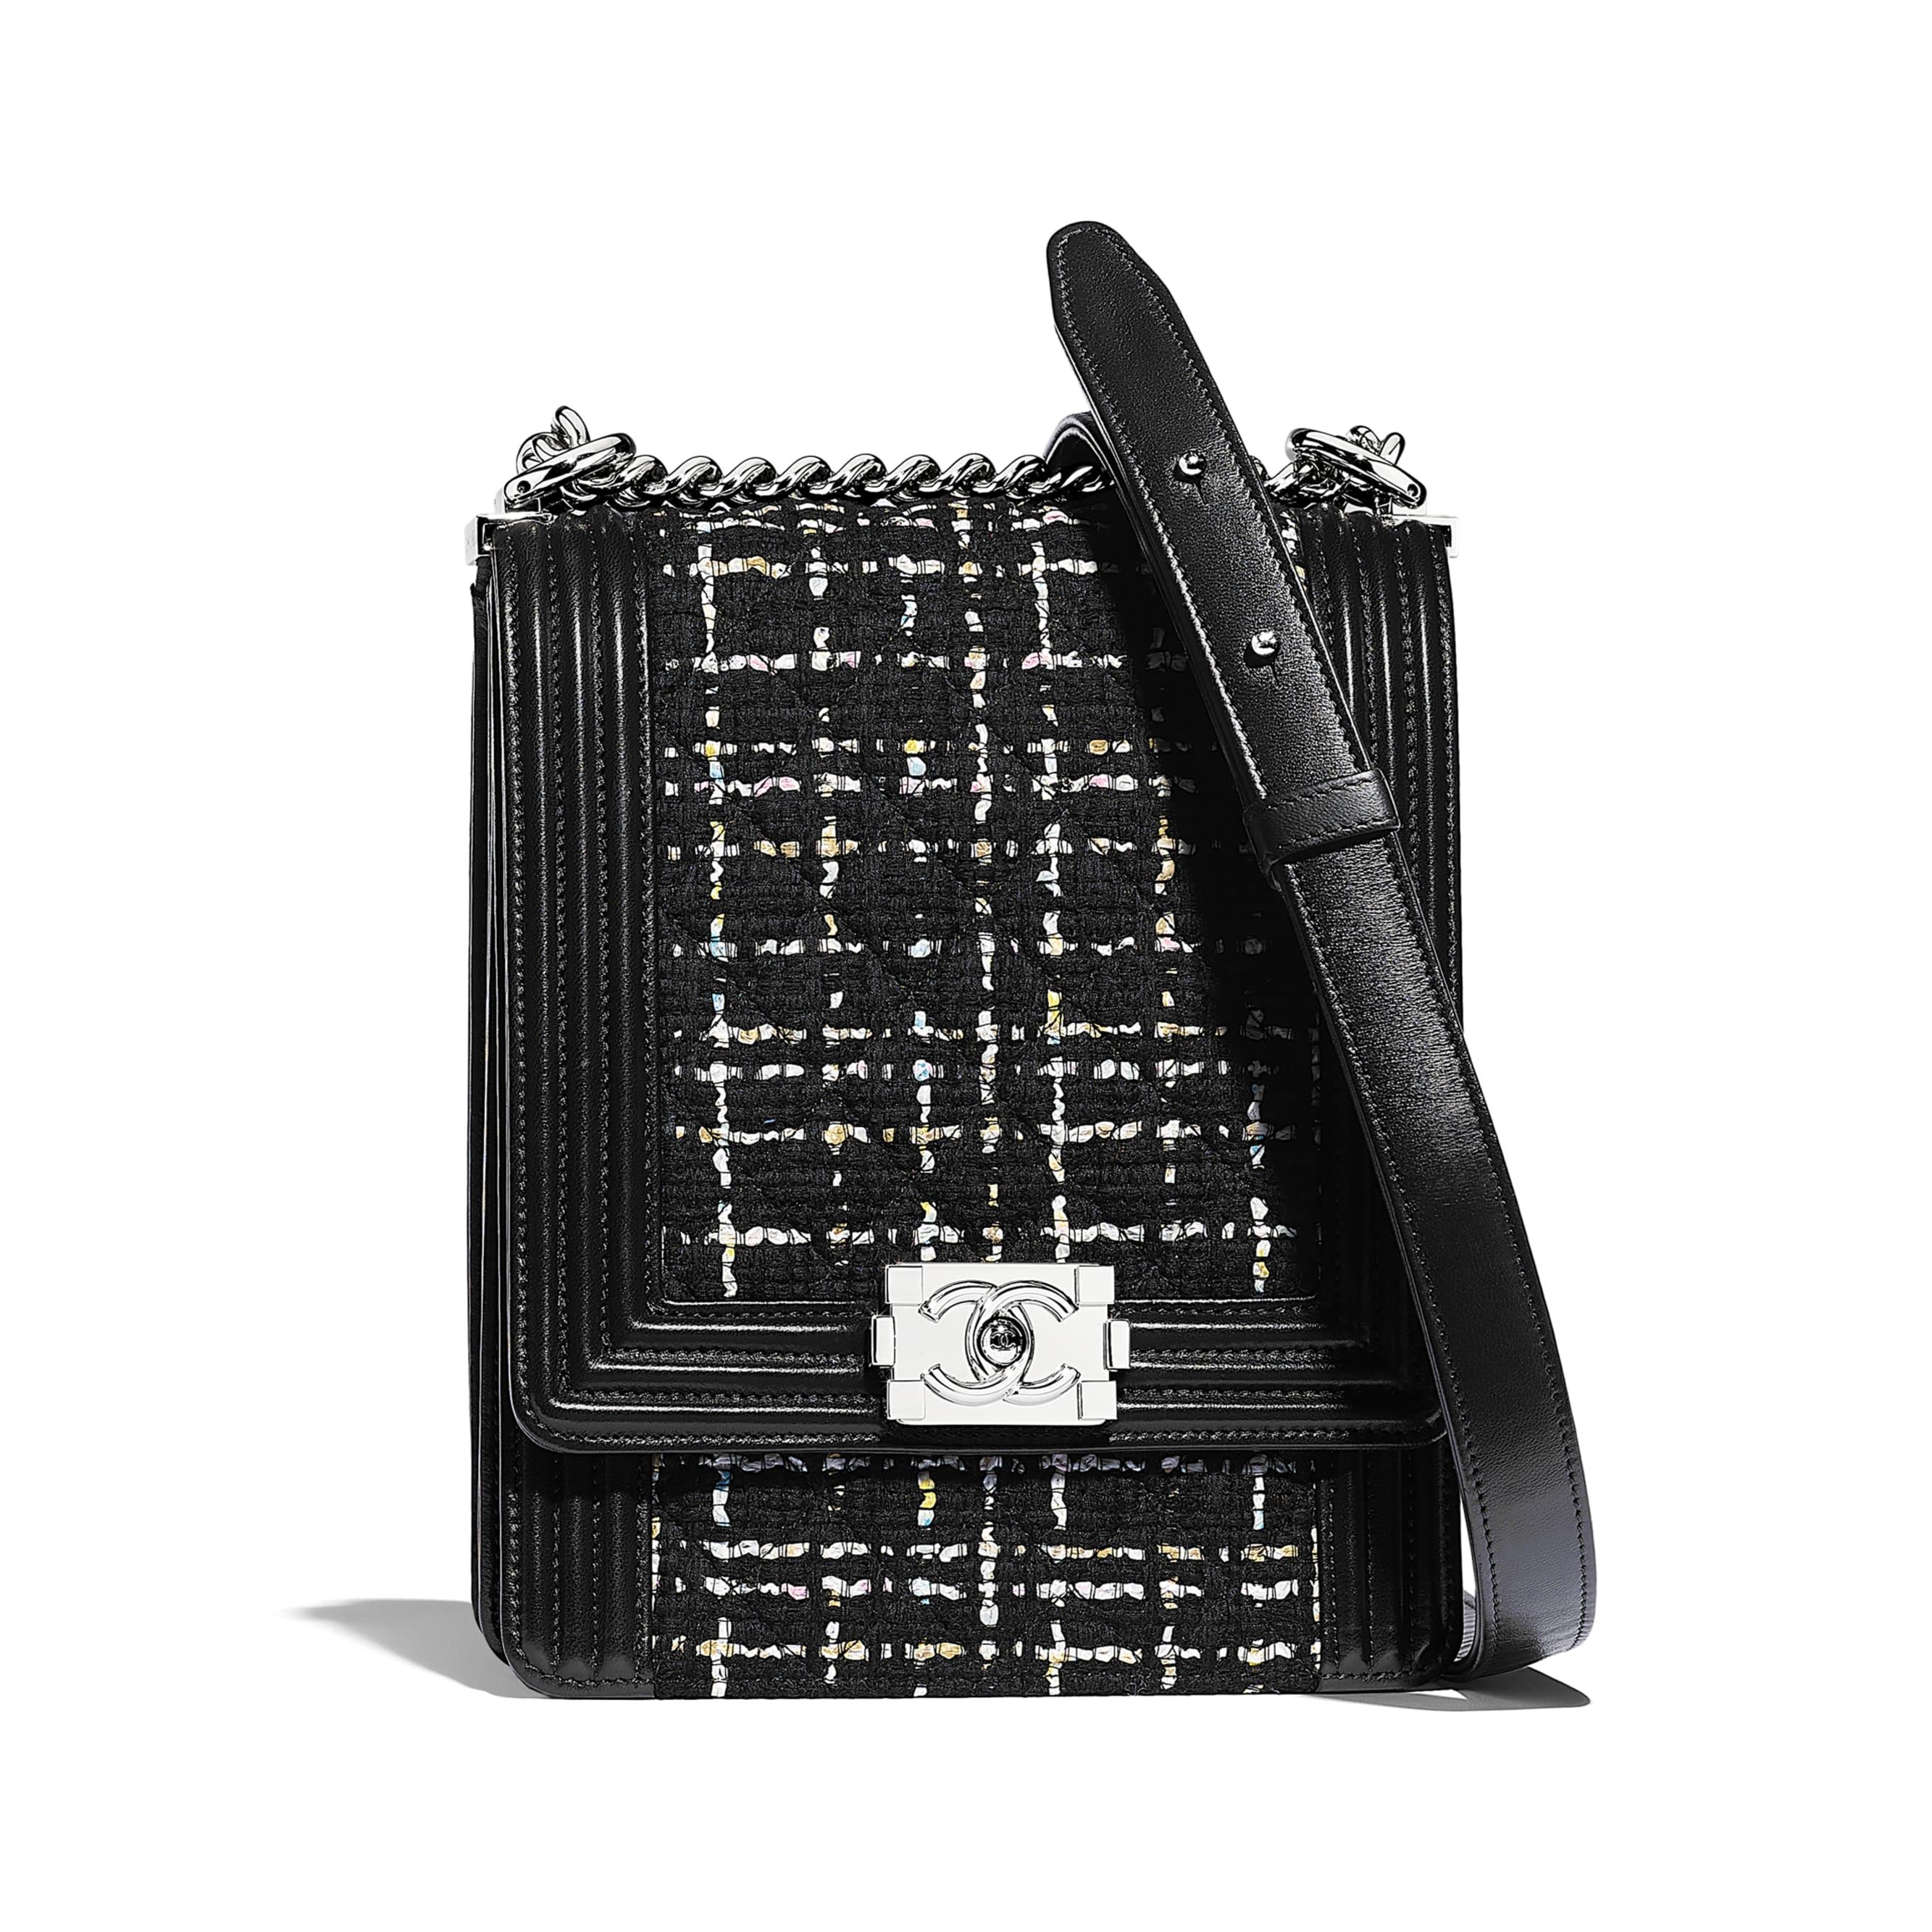 BOY CHANEL Handbag - Black, White, Pink & Yellow - Tweed, Calfskin & Silver-Tone Metal - Default view - see standard sized version